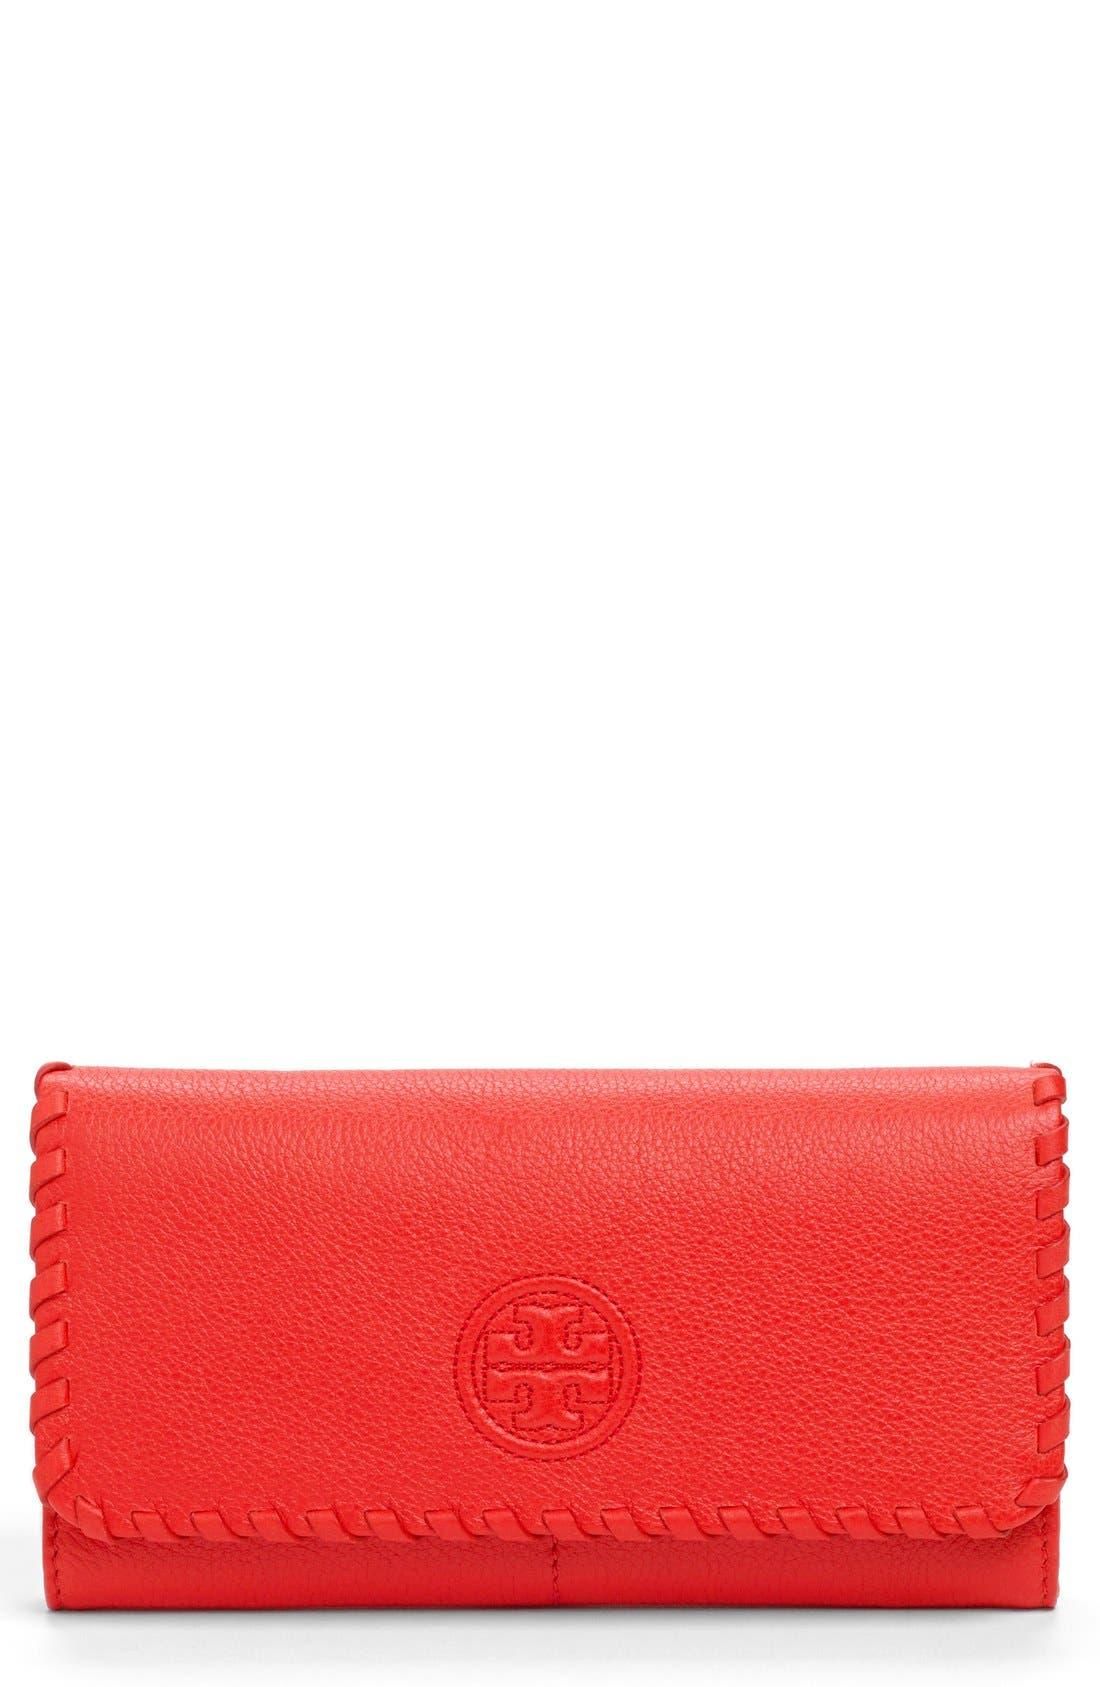 Alternate Image 1 Selected - Tory Burch 'Marion' Envelope Wallet